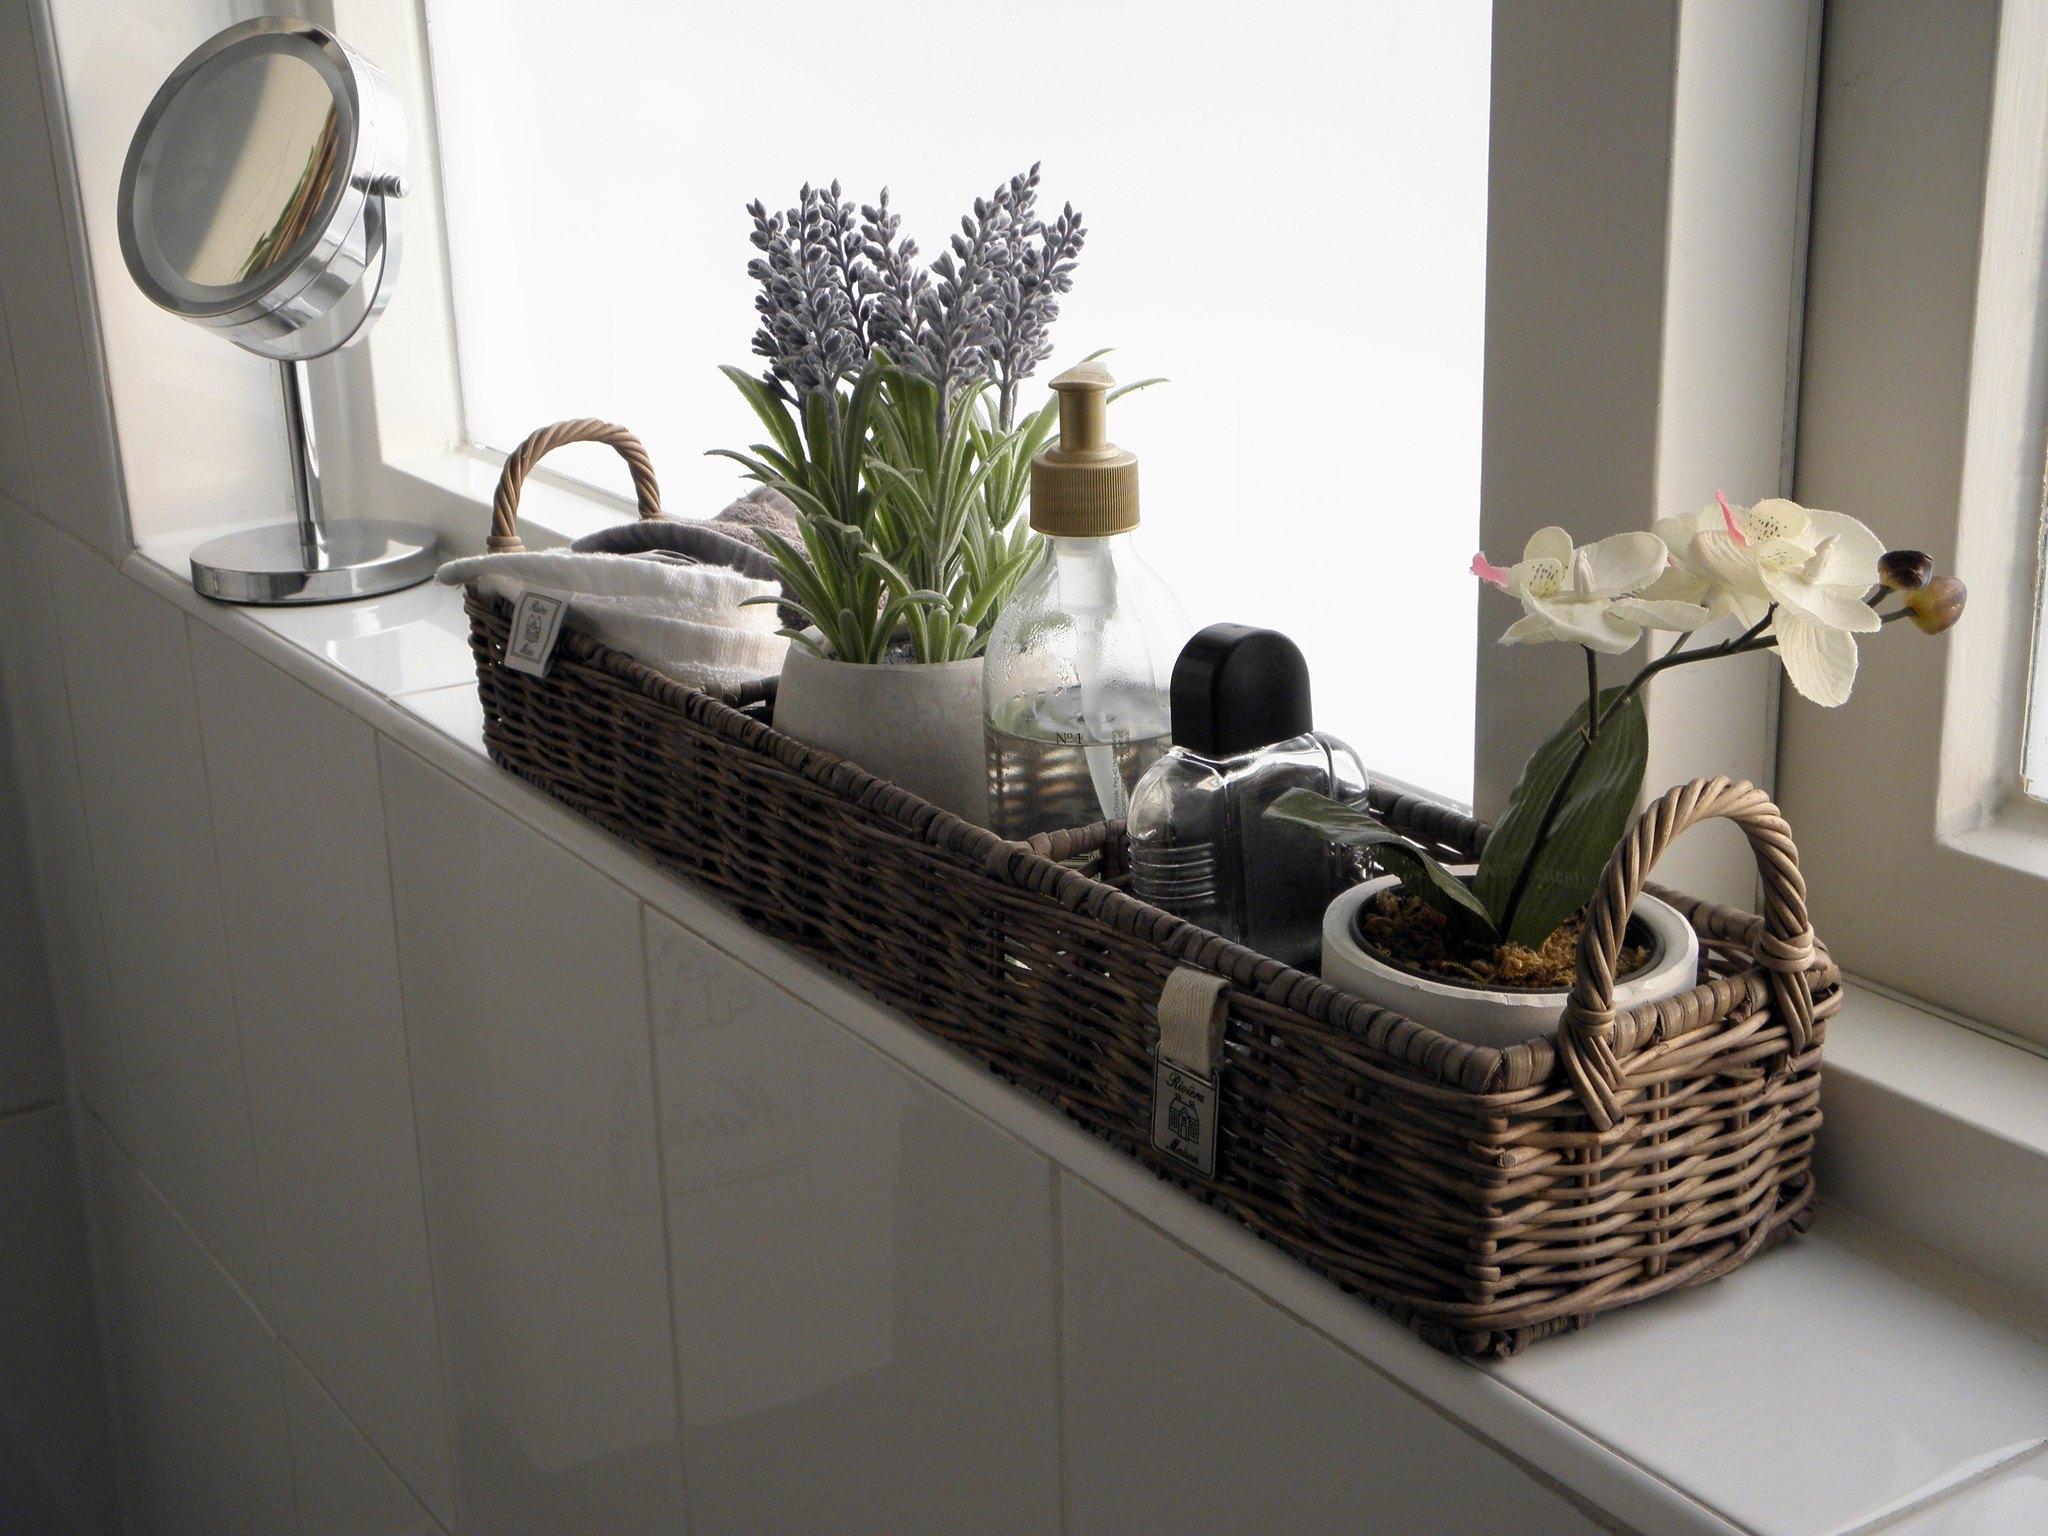 Riviera Maison Badkamer. Elegant Rm Stijlkamers Things We Love With ...